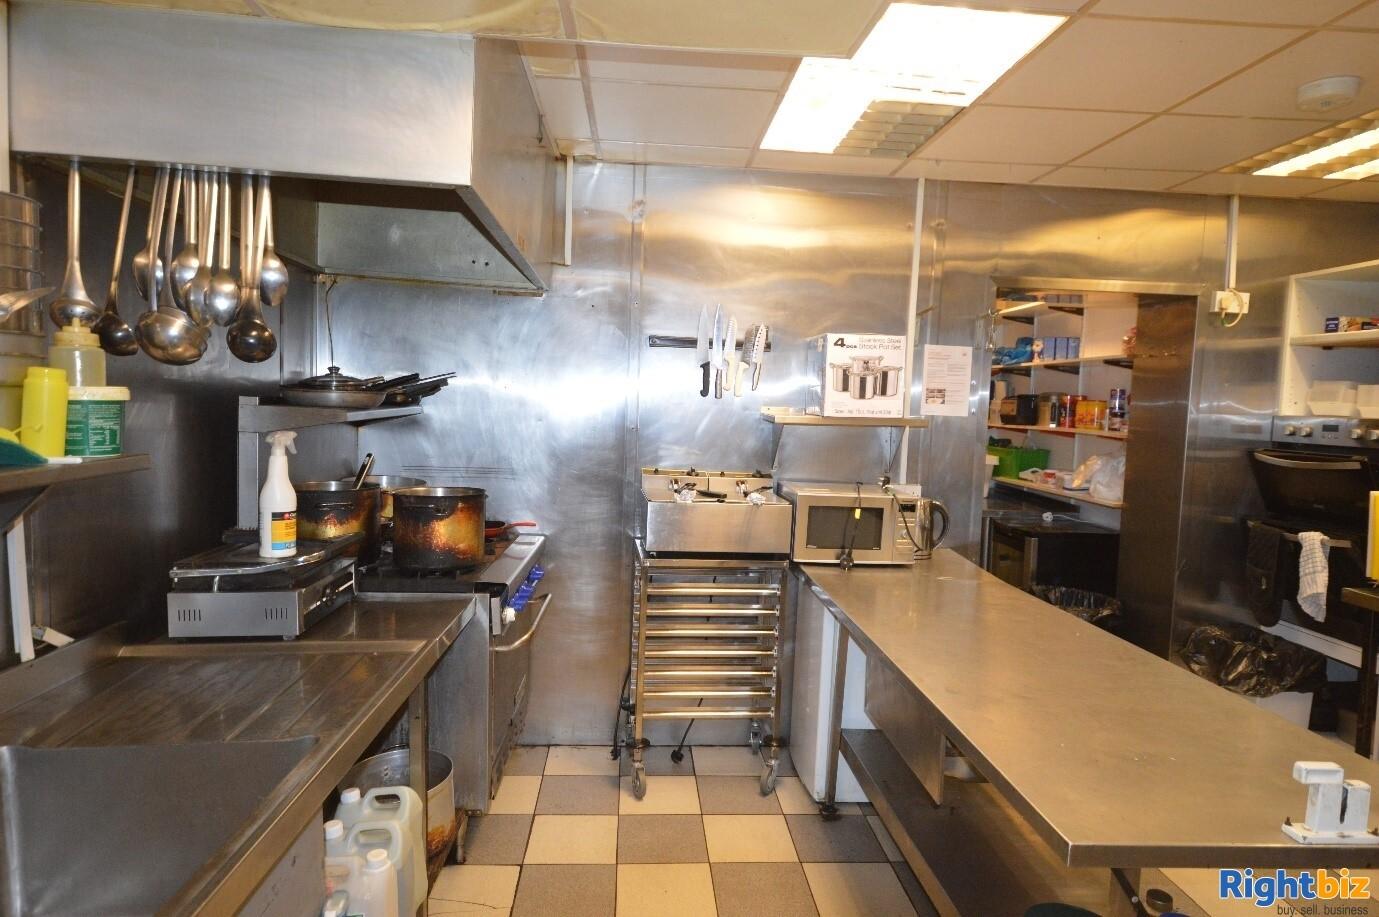 Full Class 3 hot food takeaway in Edinburgh city centre (ref 1396) - Image 8